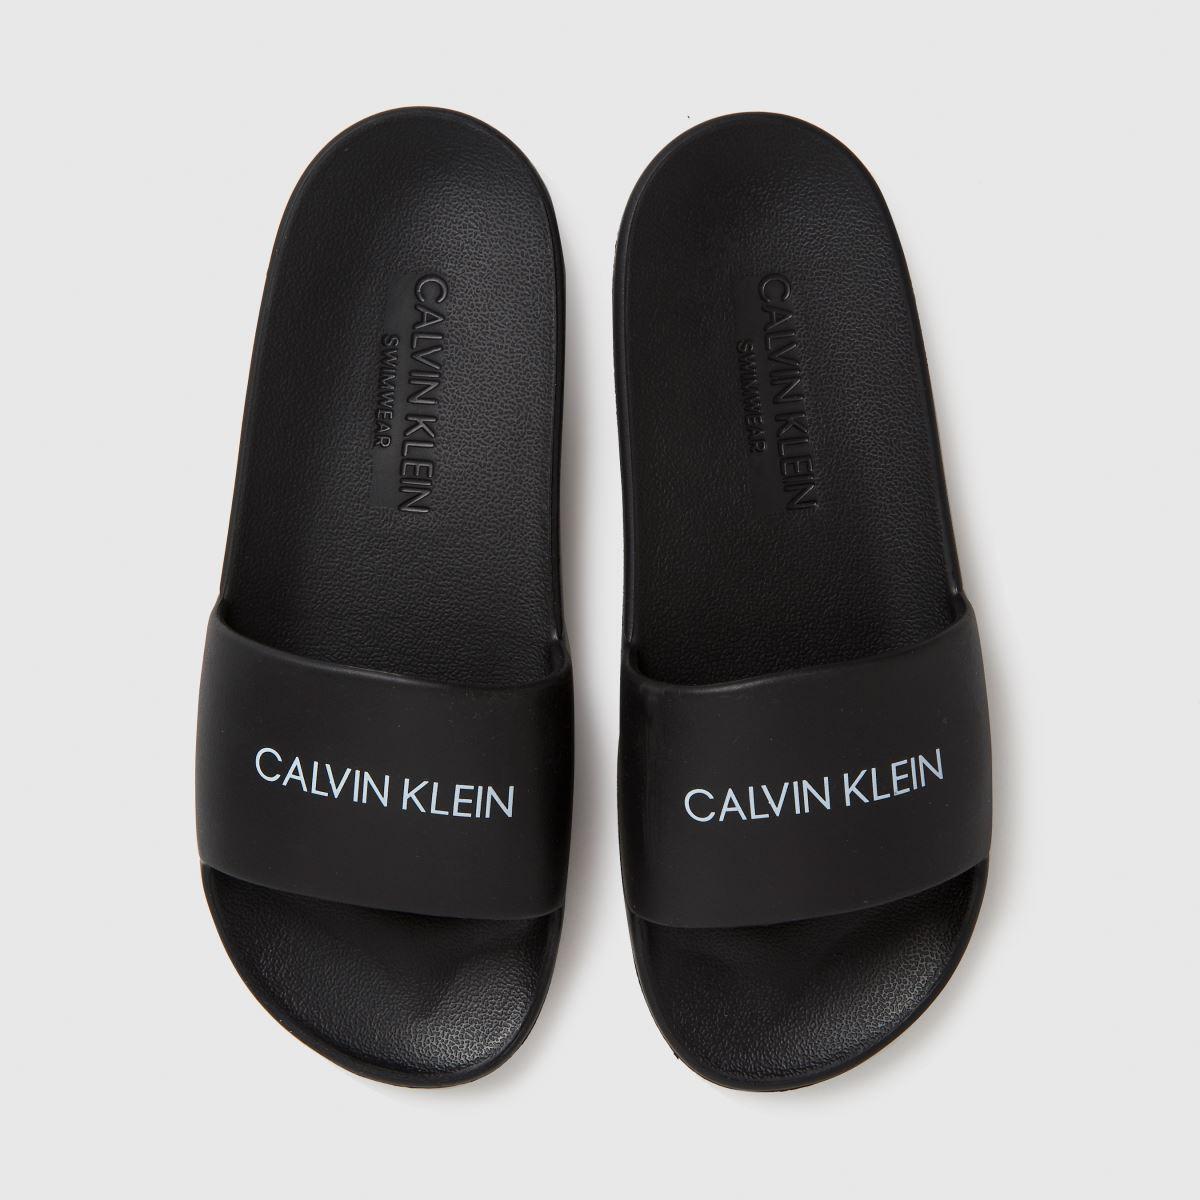 CALVIN KLEIN Black Slides Sliders Junior